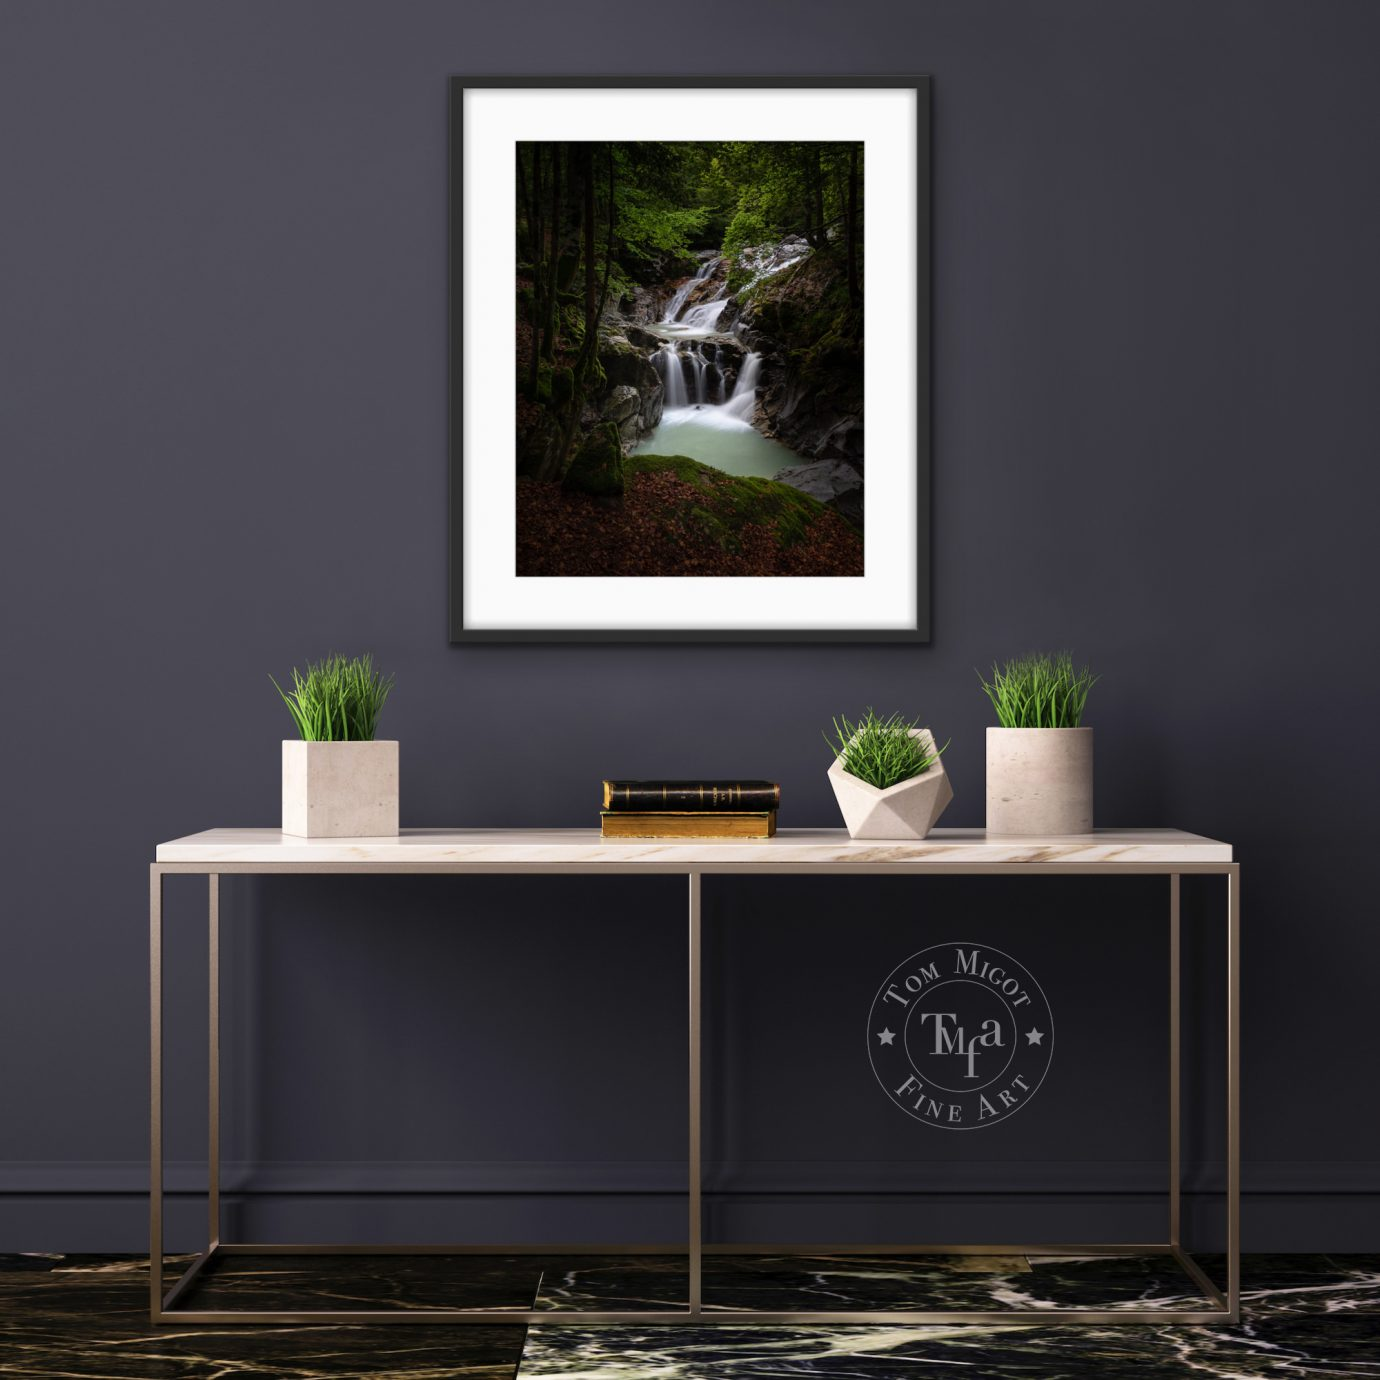 The Bious Waterfalls Room